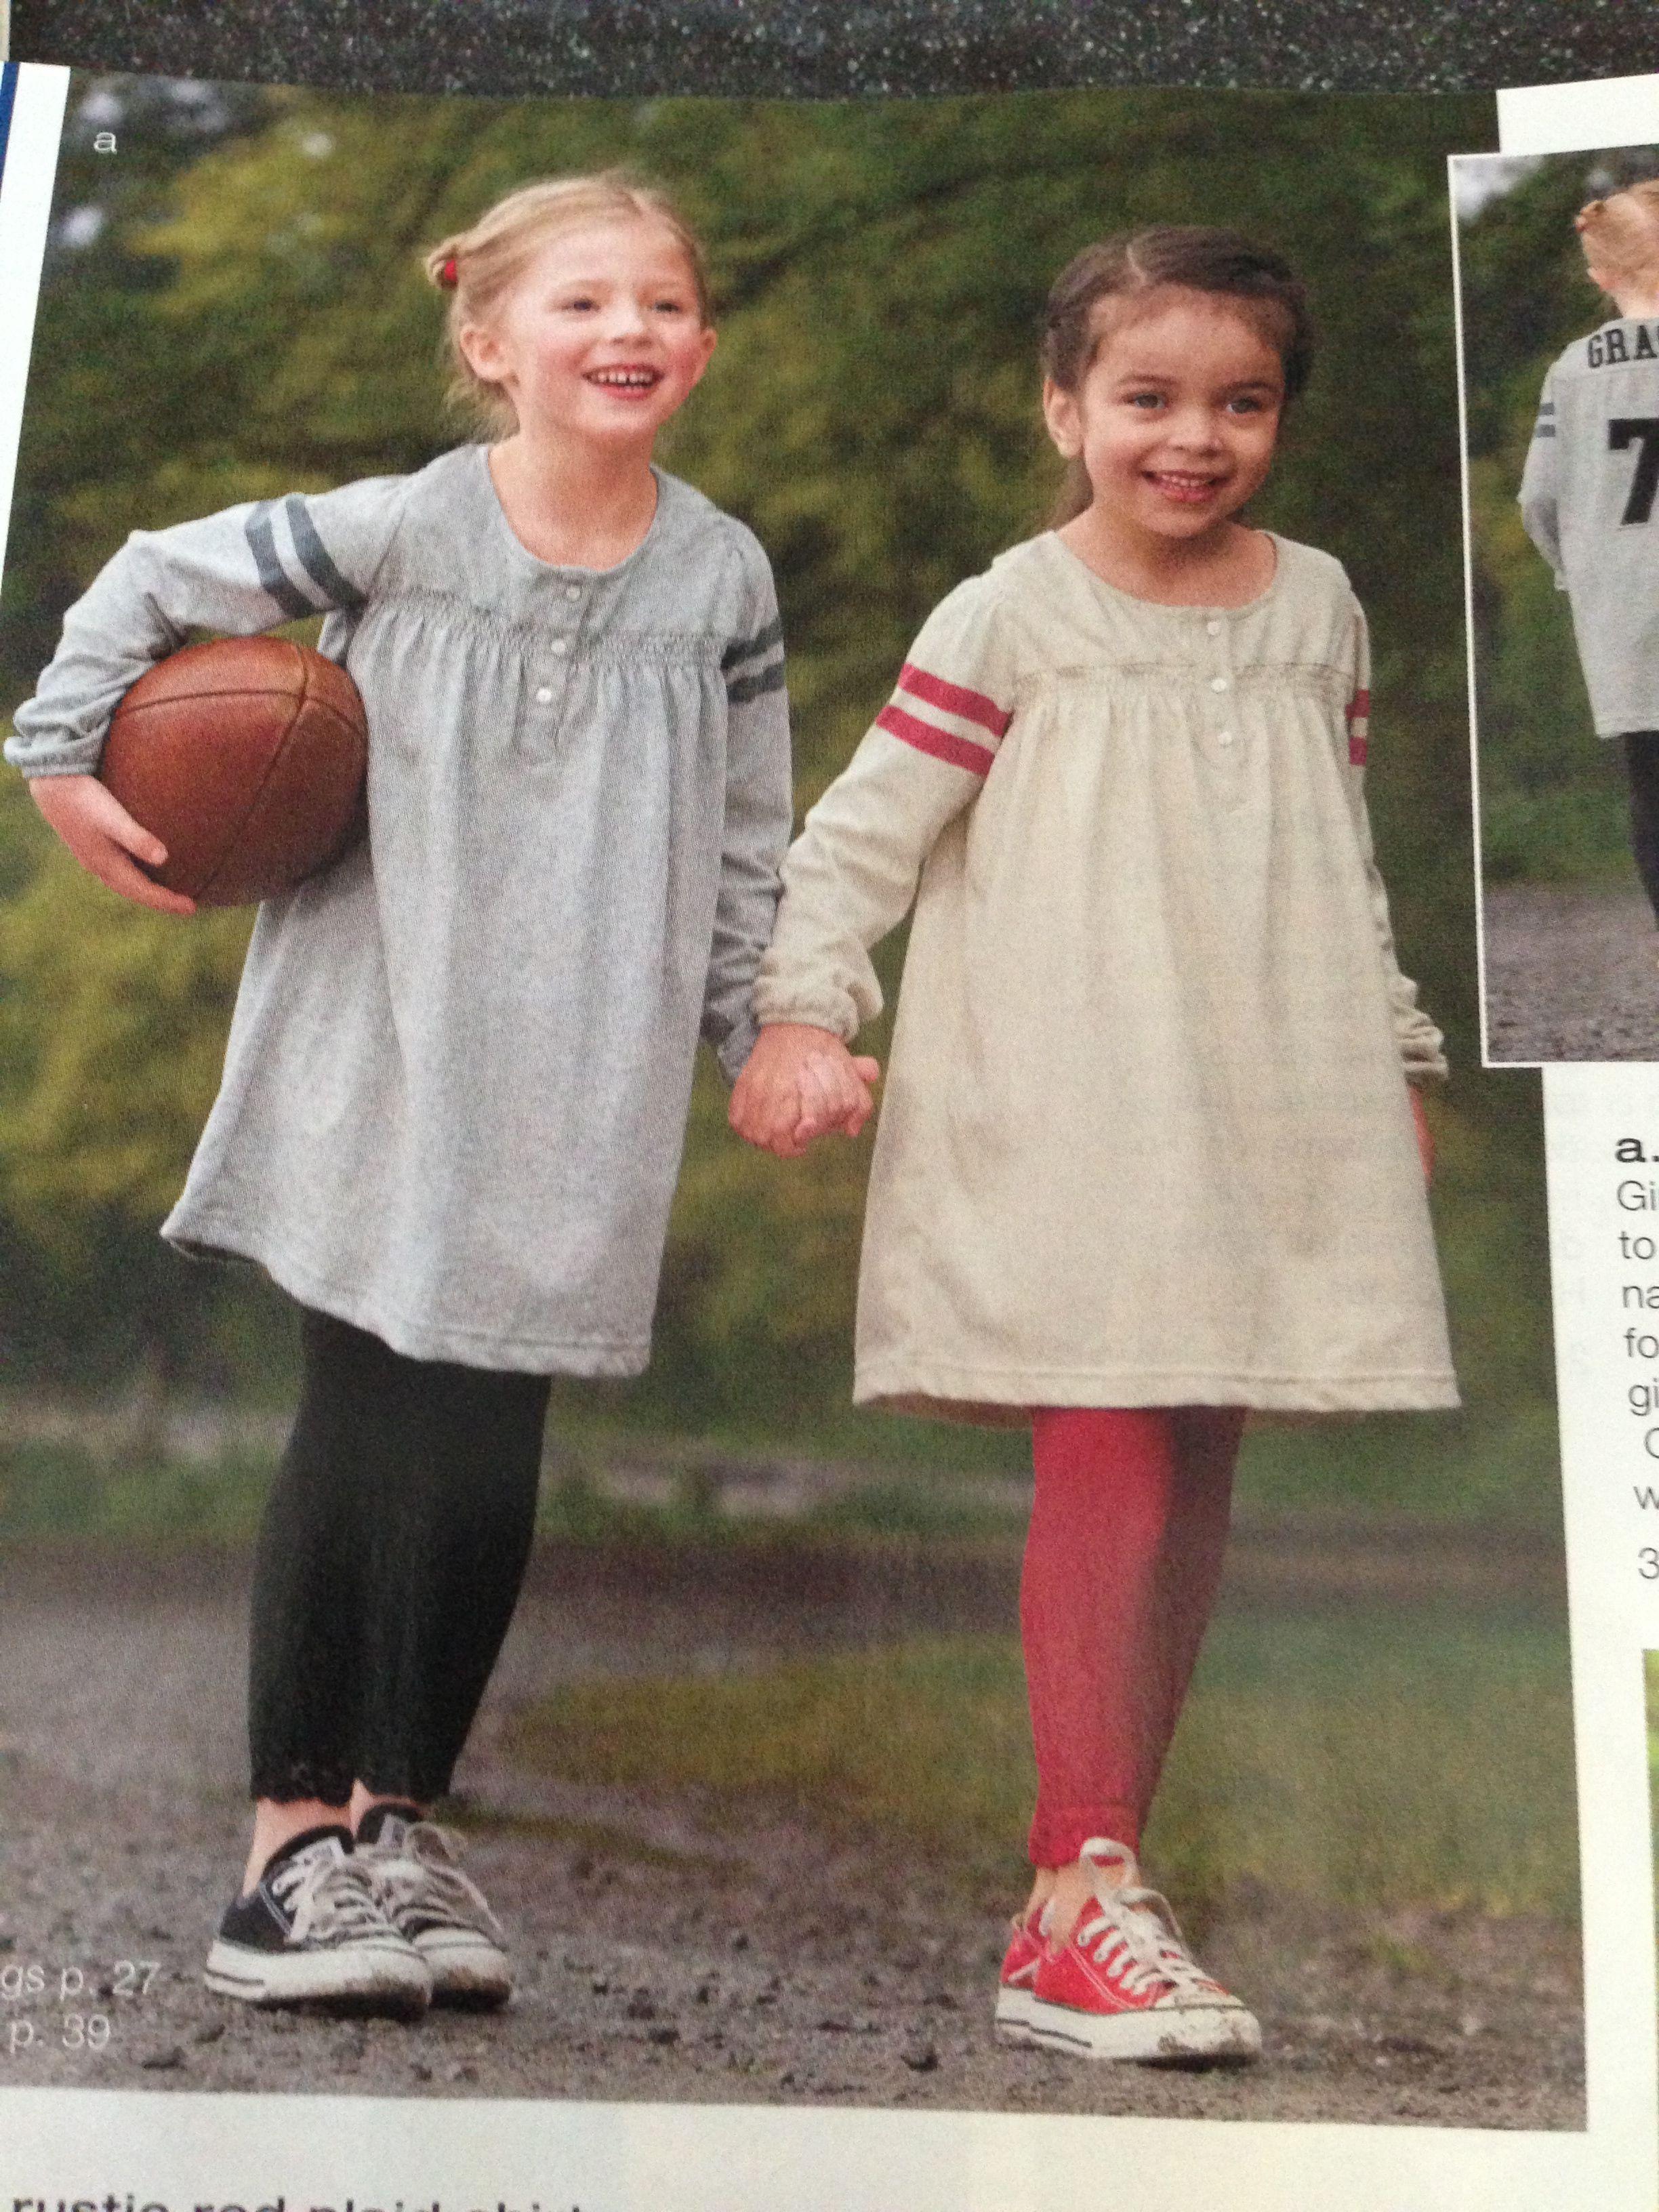 Football dresses.